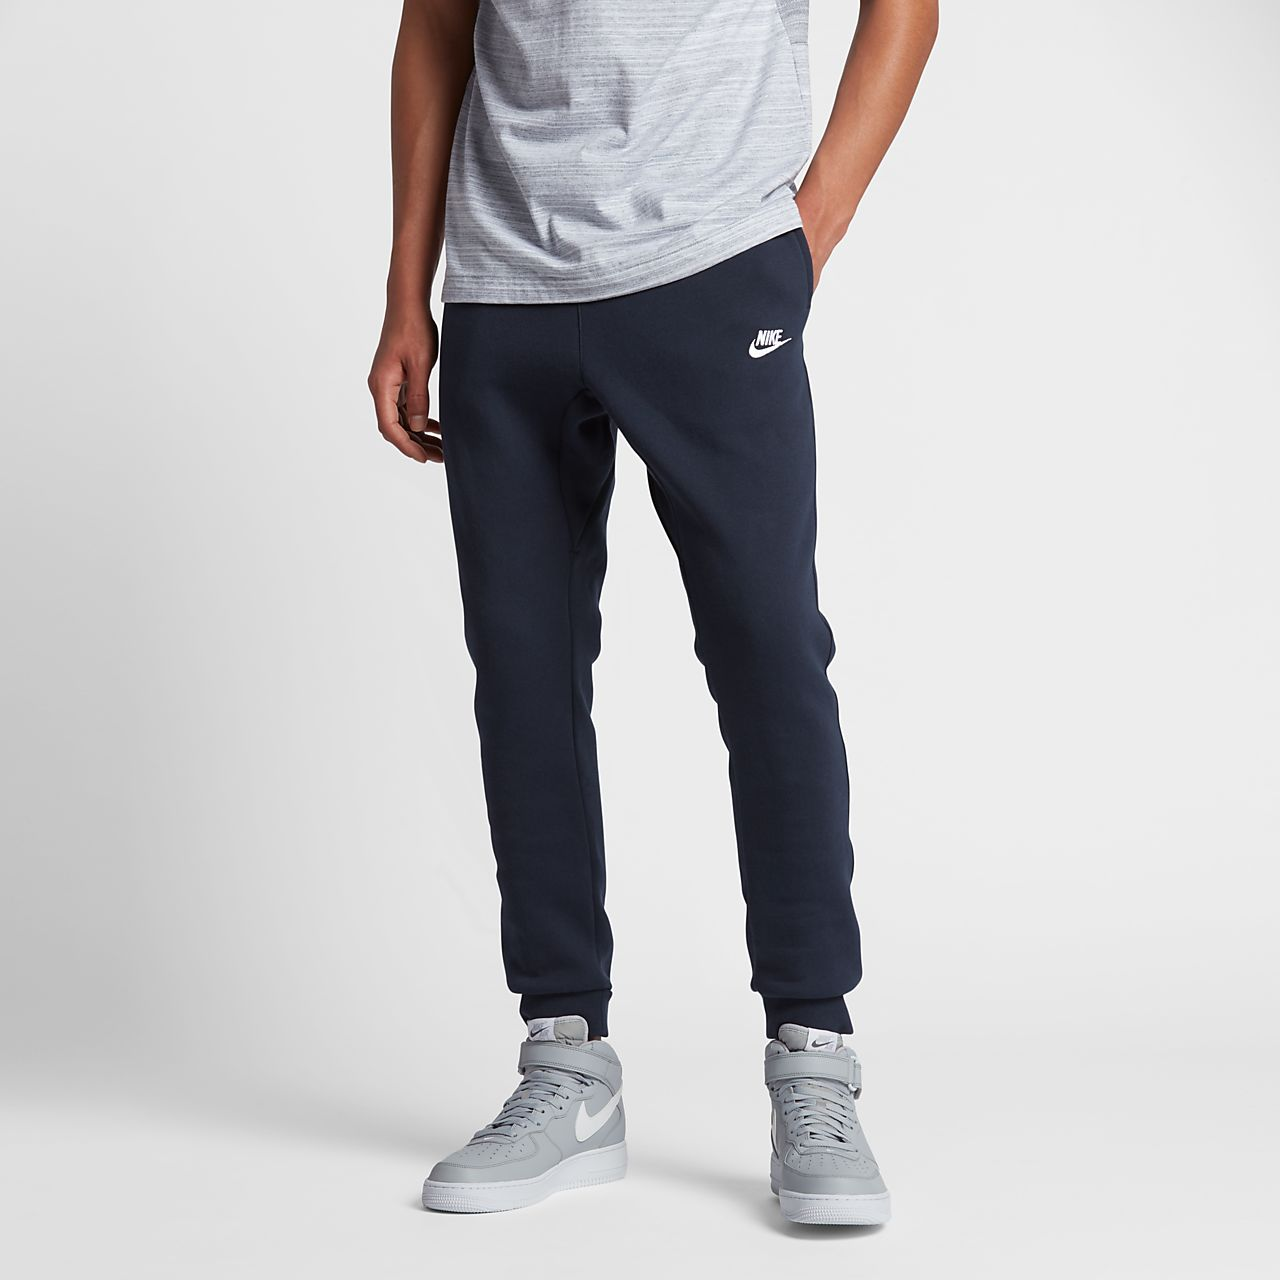 35a93be9 Nike Sportswear Club Fleece Men's Joggers. Nike.com MA